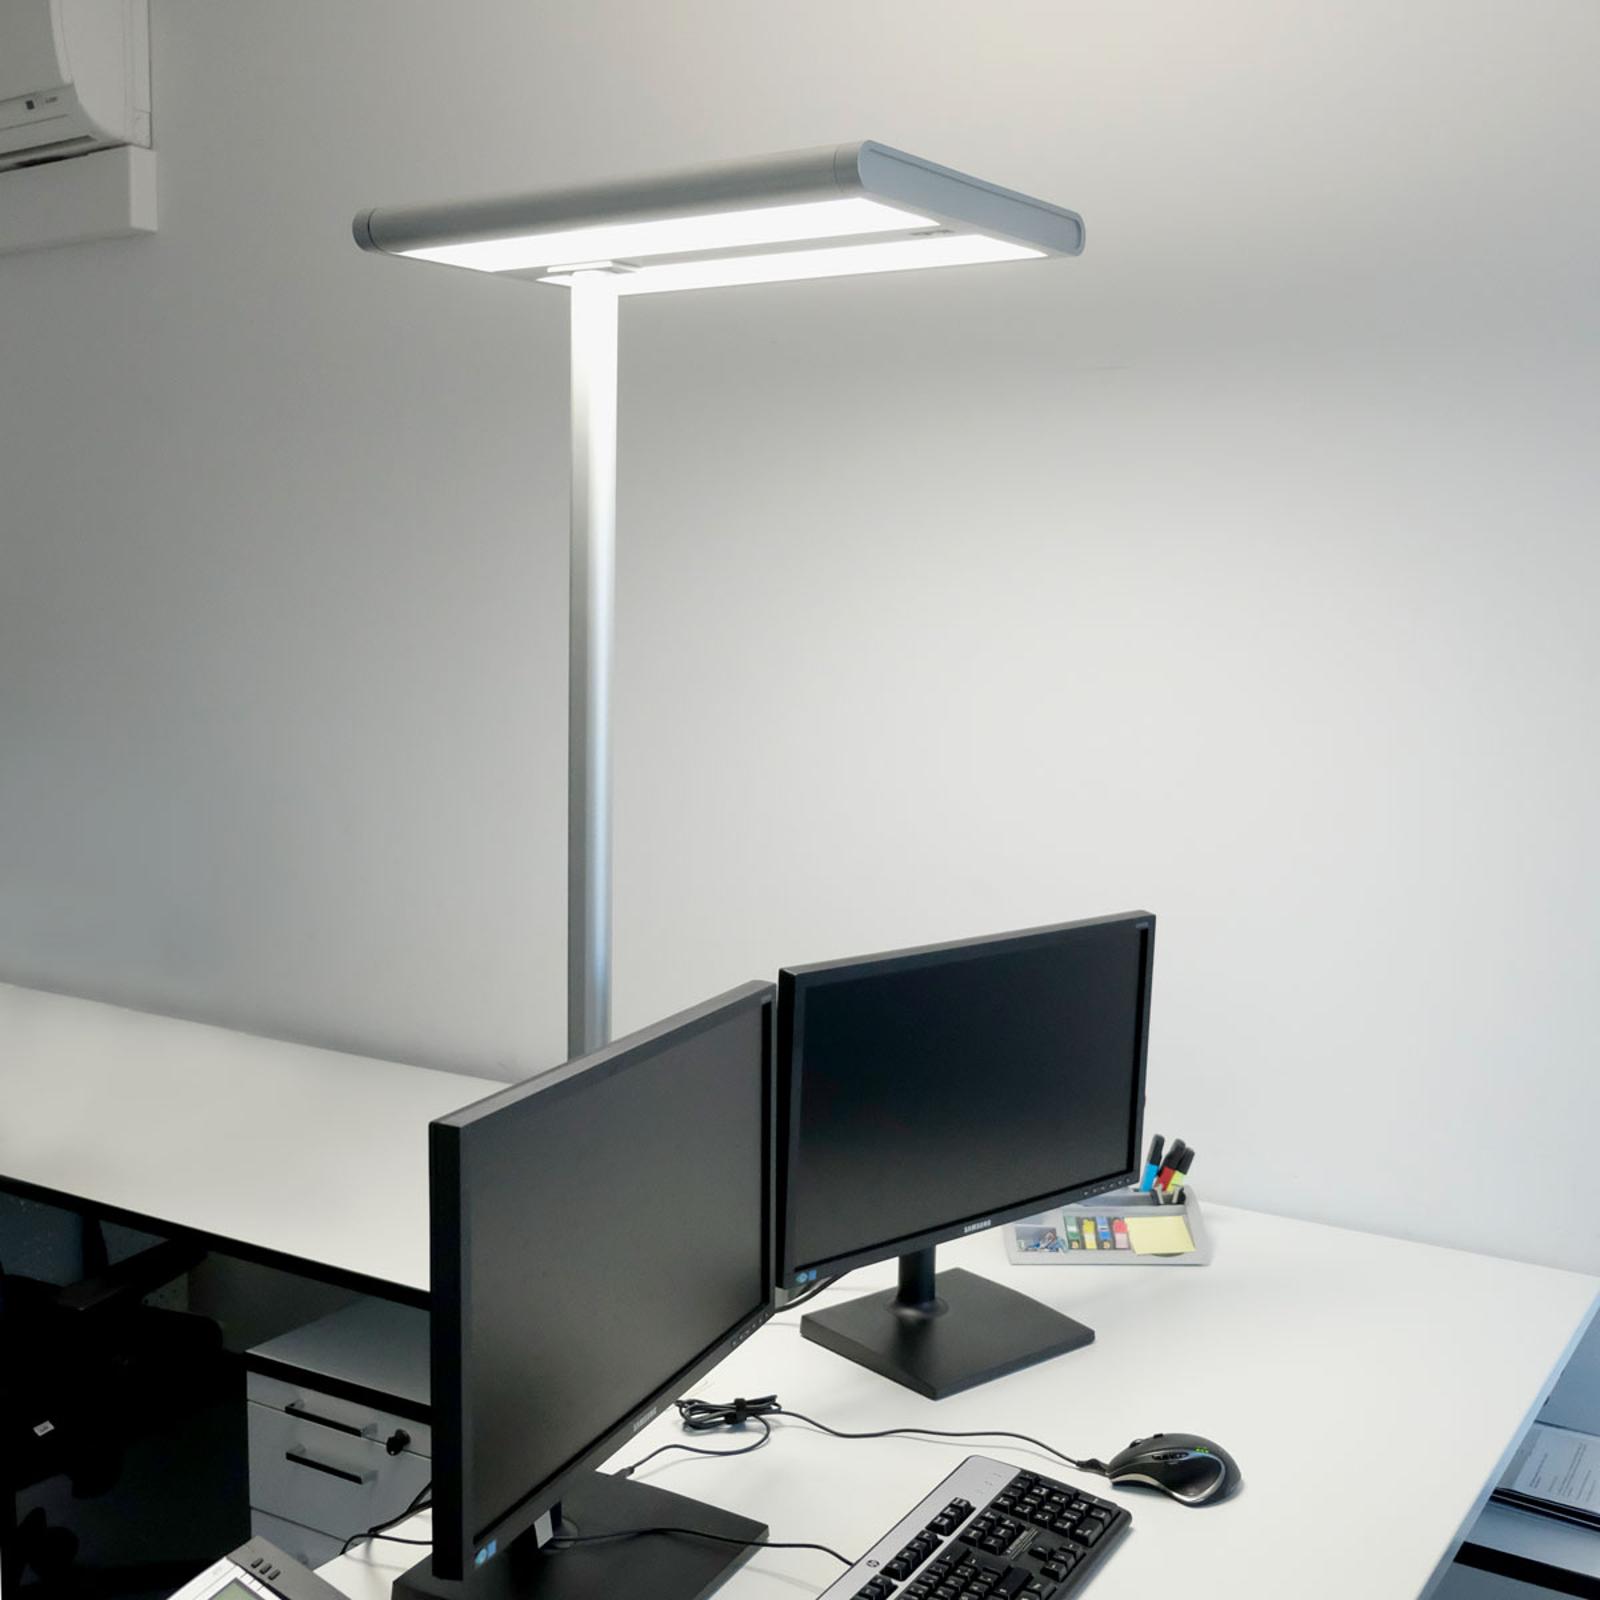 Quirin - LED office floor lamp with sensor_9966001_1